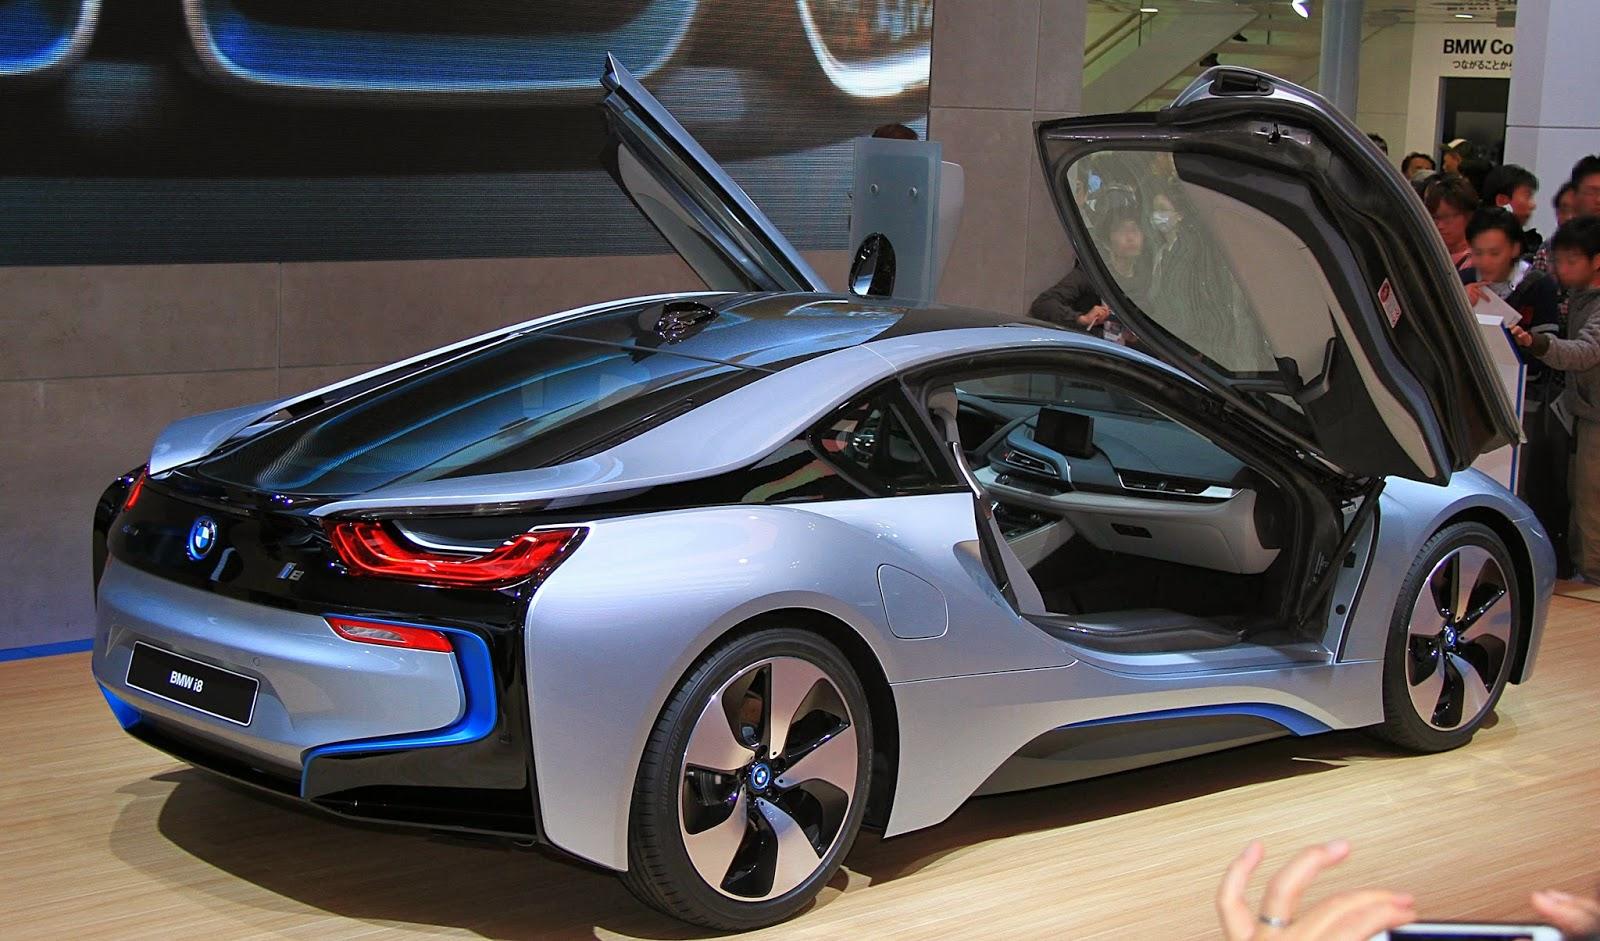 super hot cars 2014: BMW i8